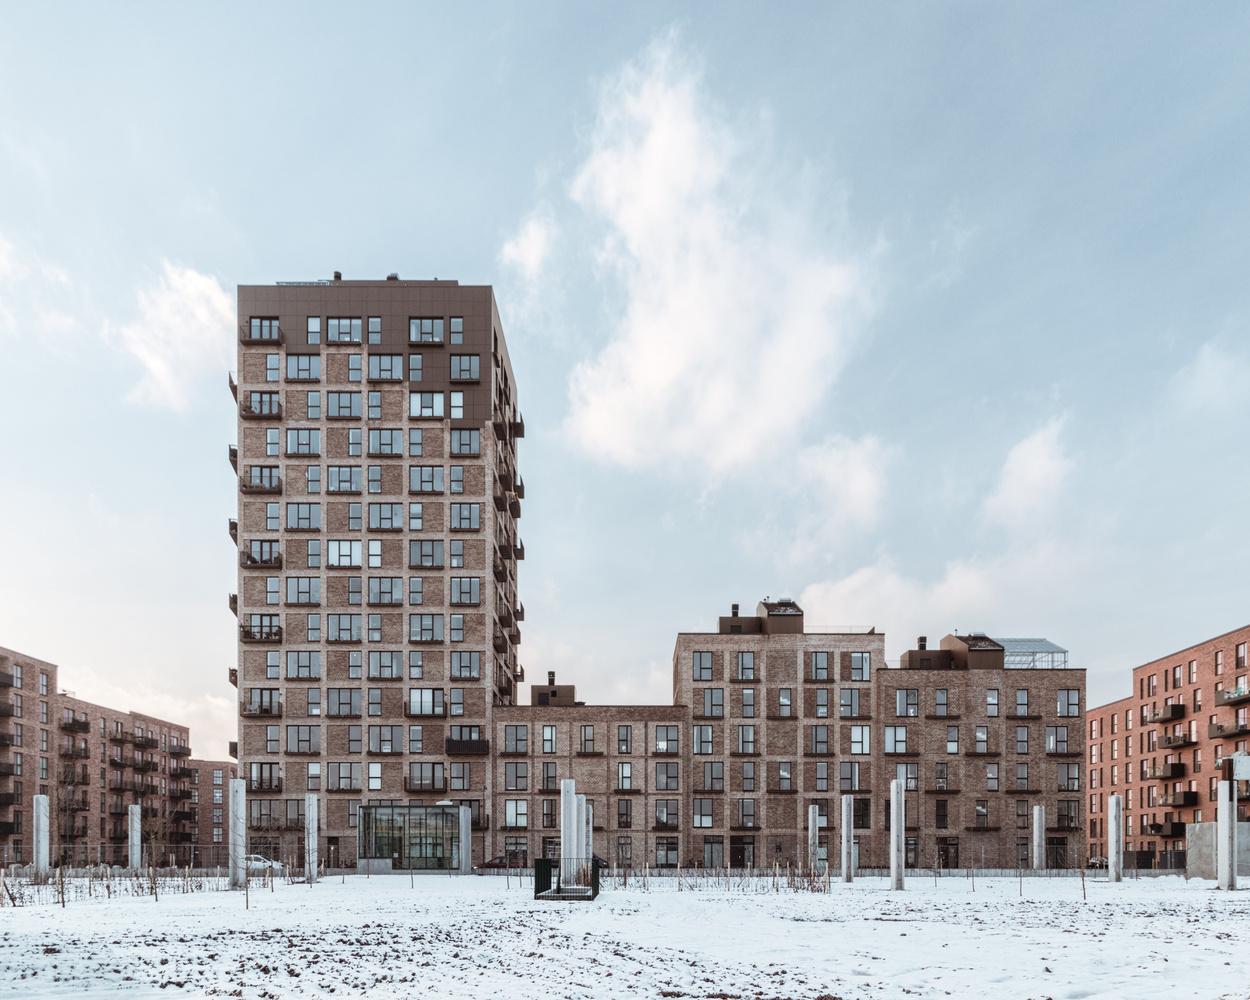 Amaryllis House 1 by Kristian Lildholdt Hansen